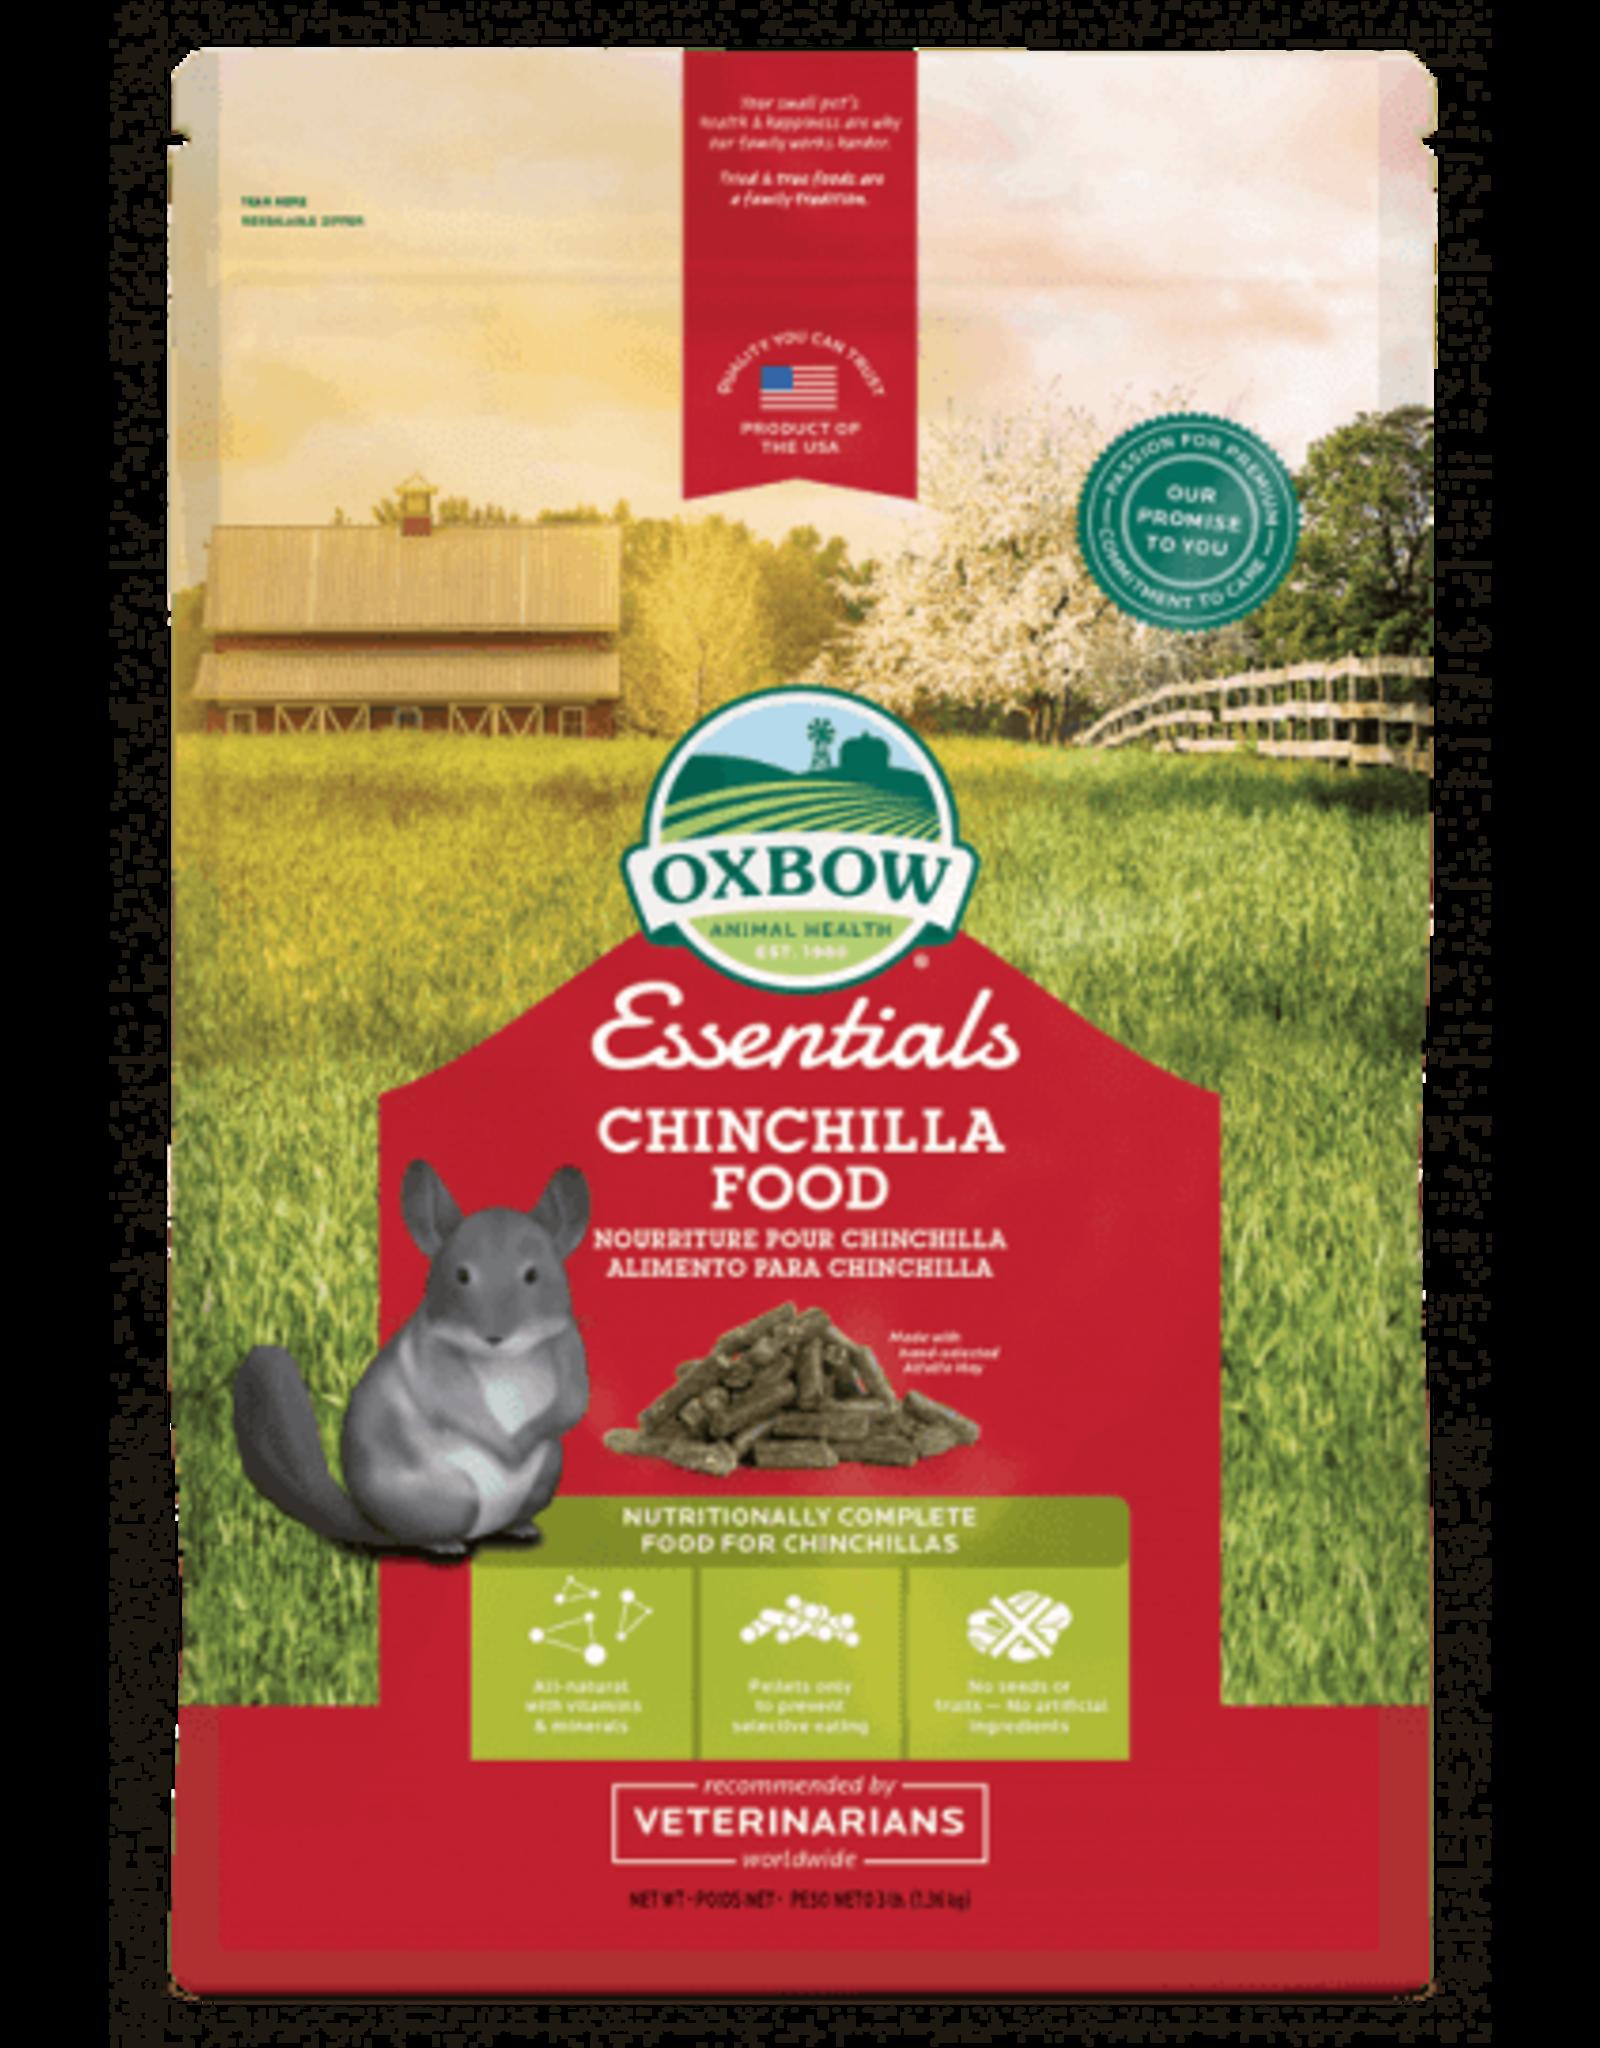 Oxbow OXBOW Essentials Chinchilla Food 3LB